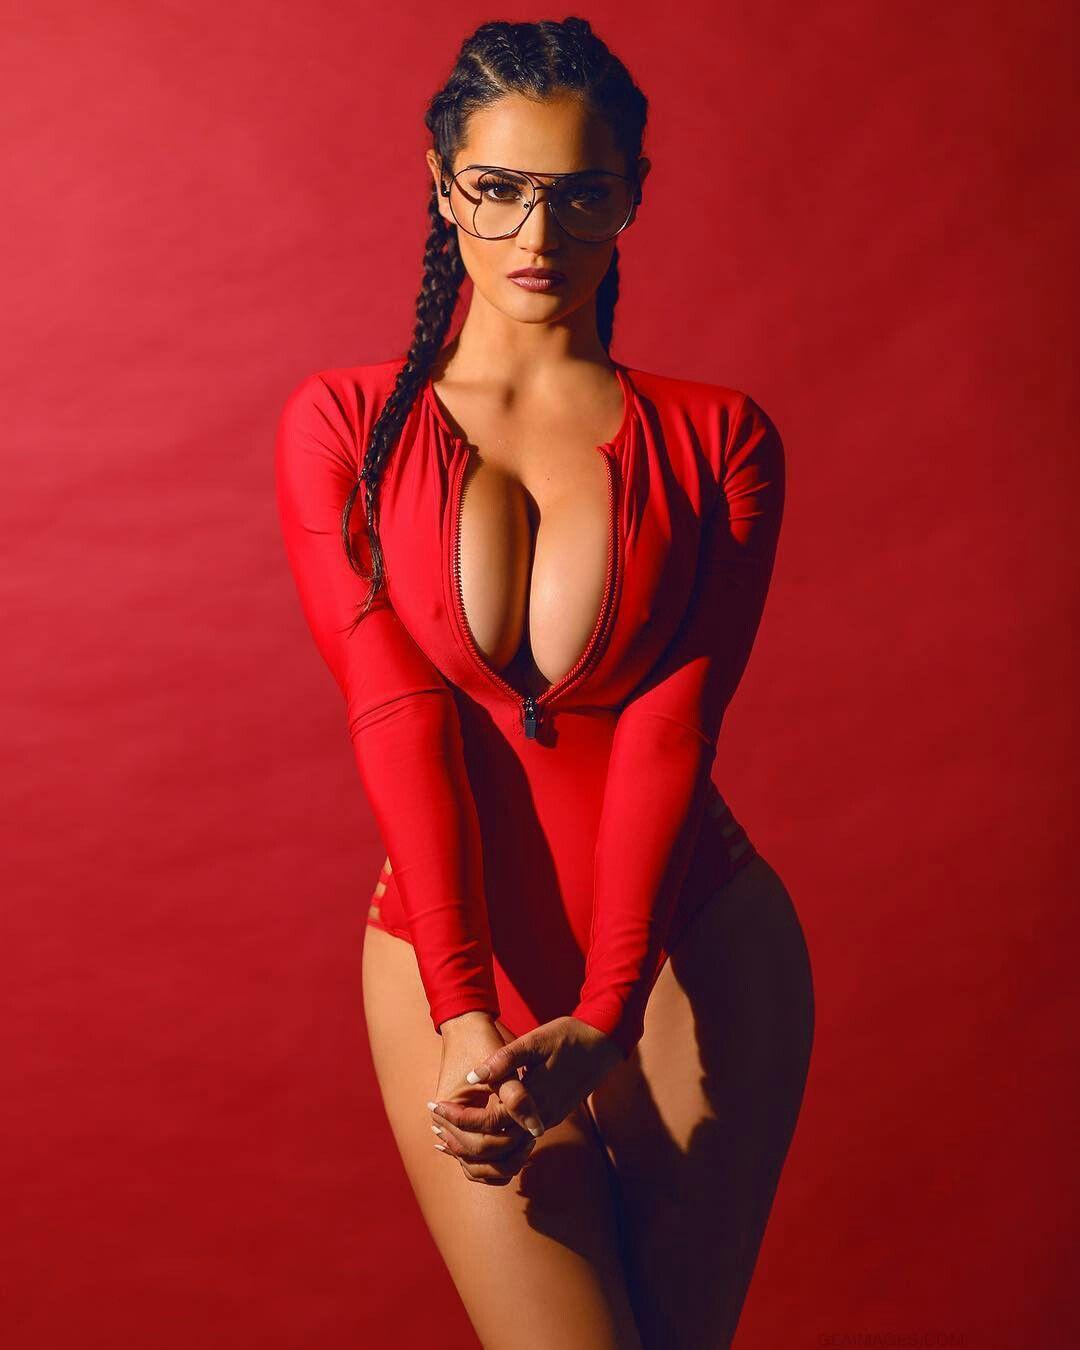 Pics Pashence Marie nude photos 2019